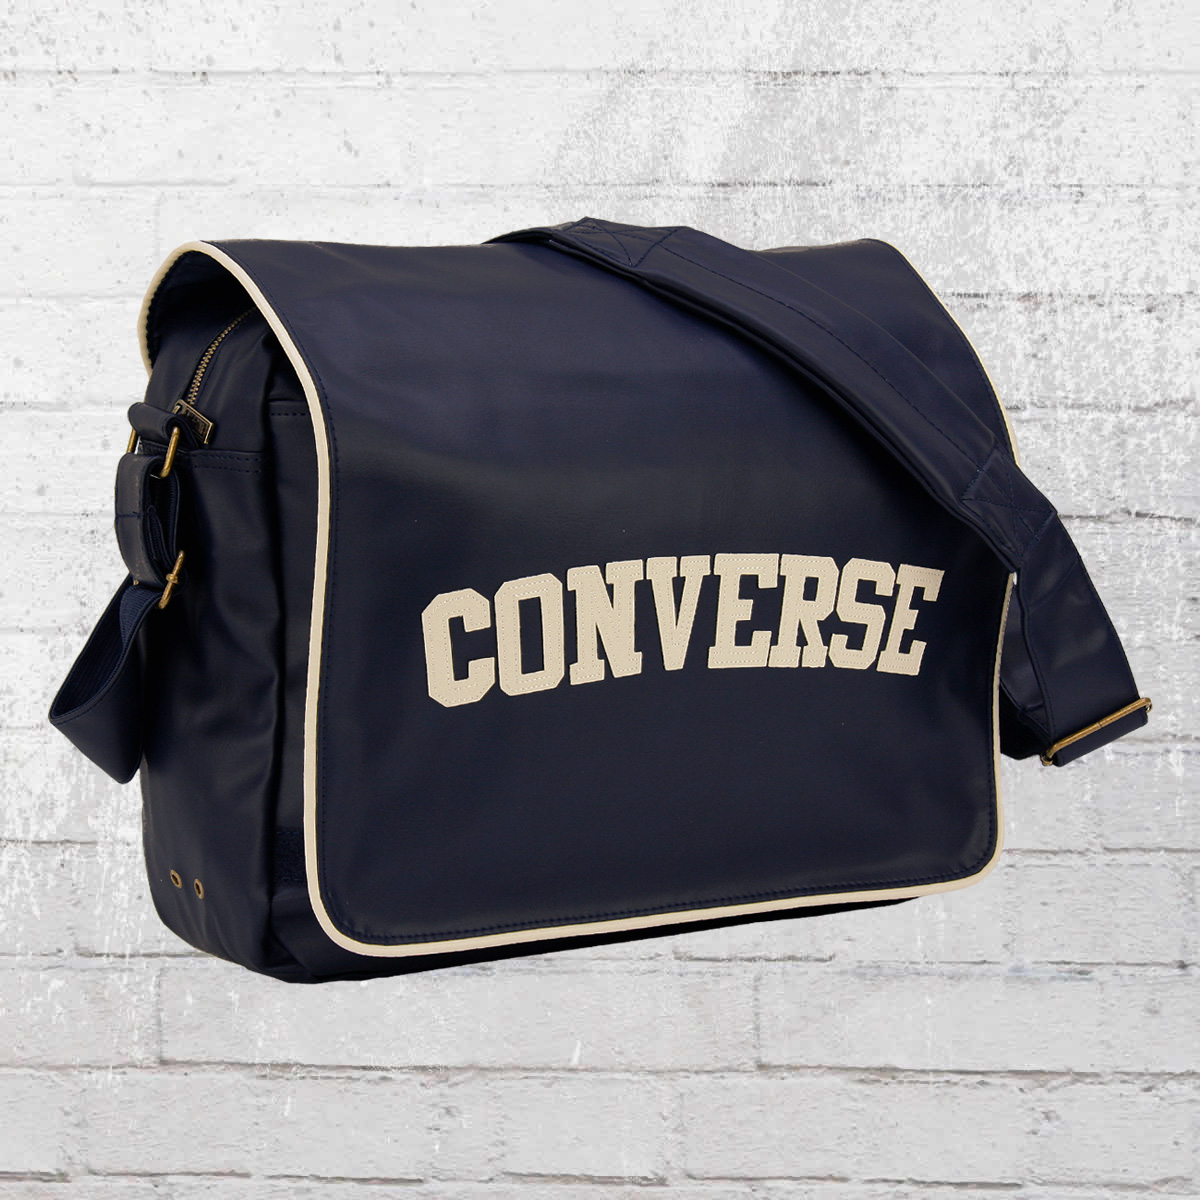 converse messenger bag